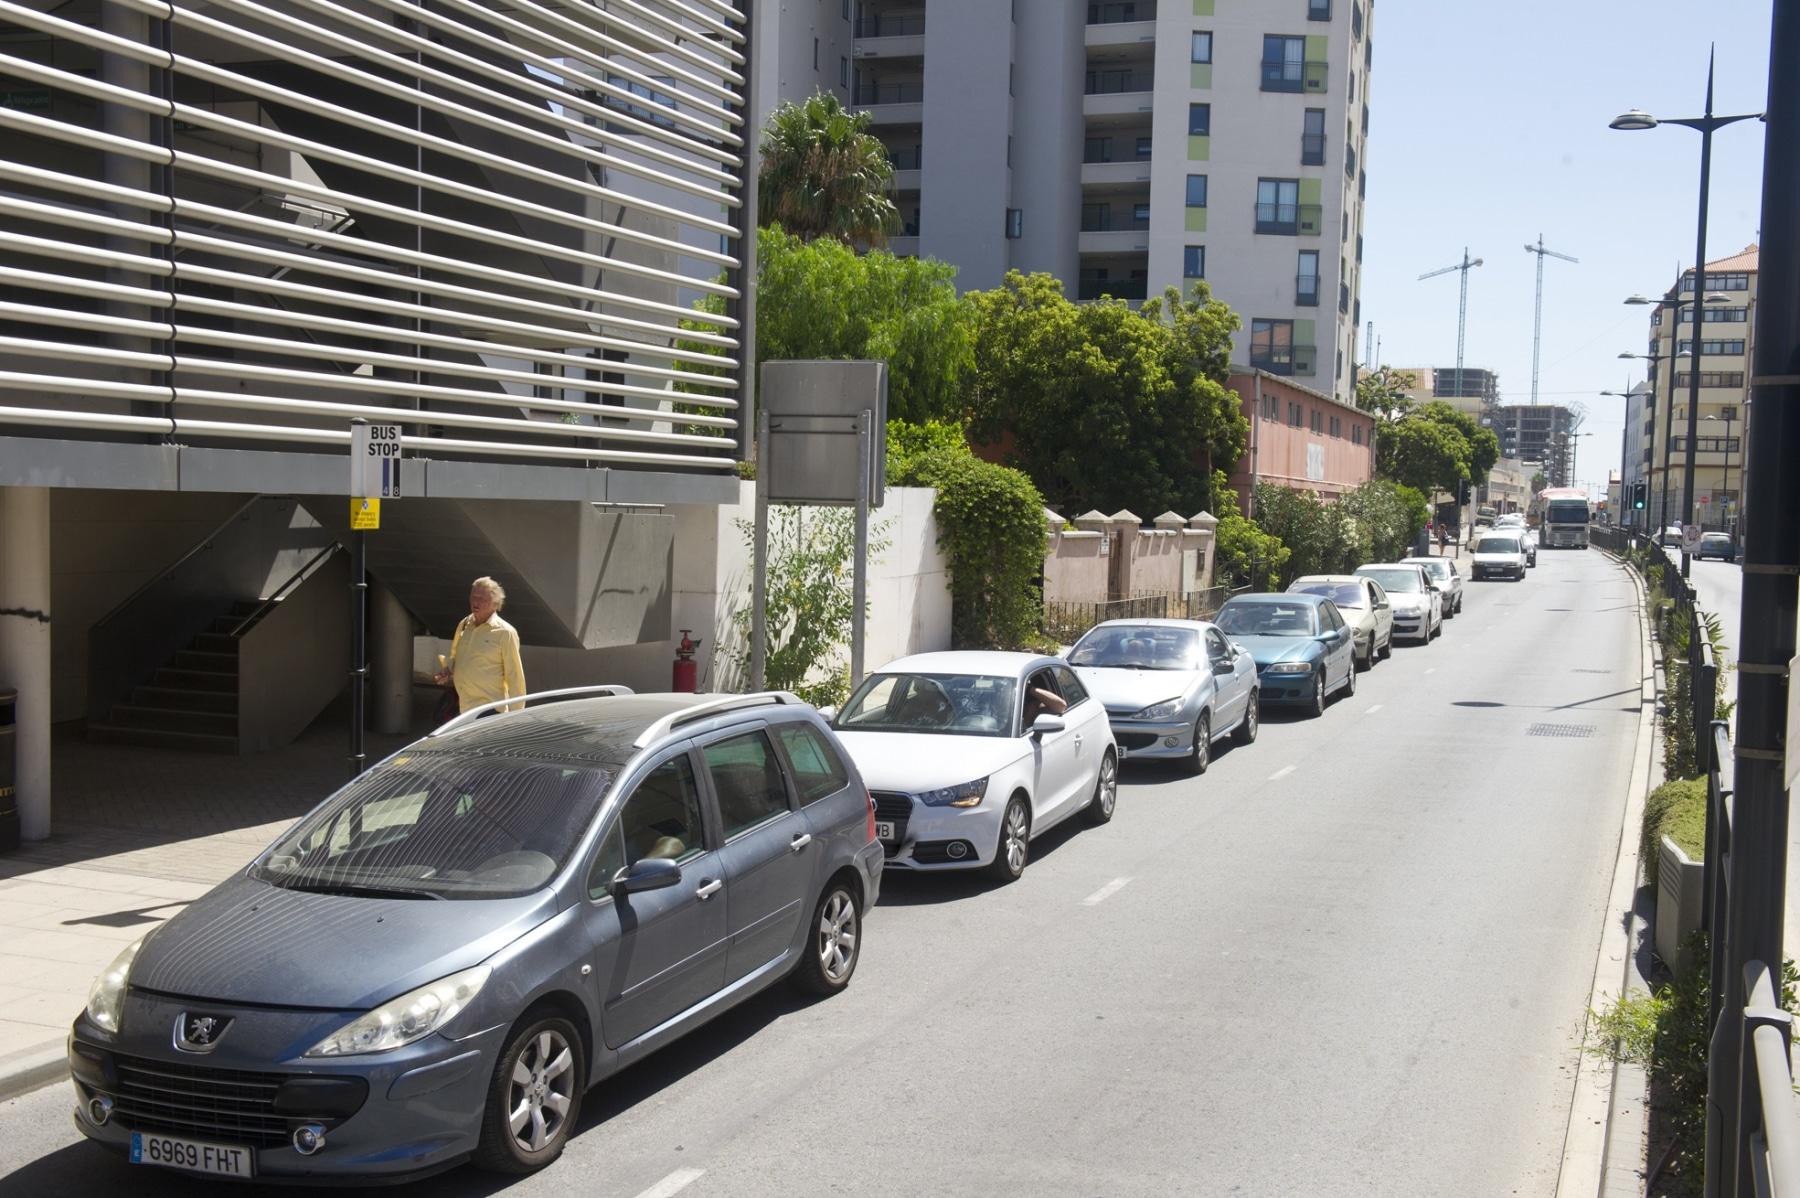 21-agosto-2014-colas-de-entrada-y-salida-de-gibraltar14_14966751946_o